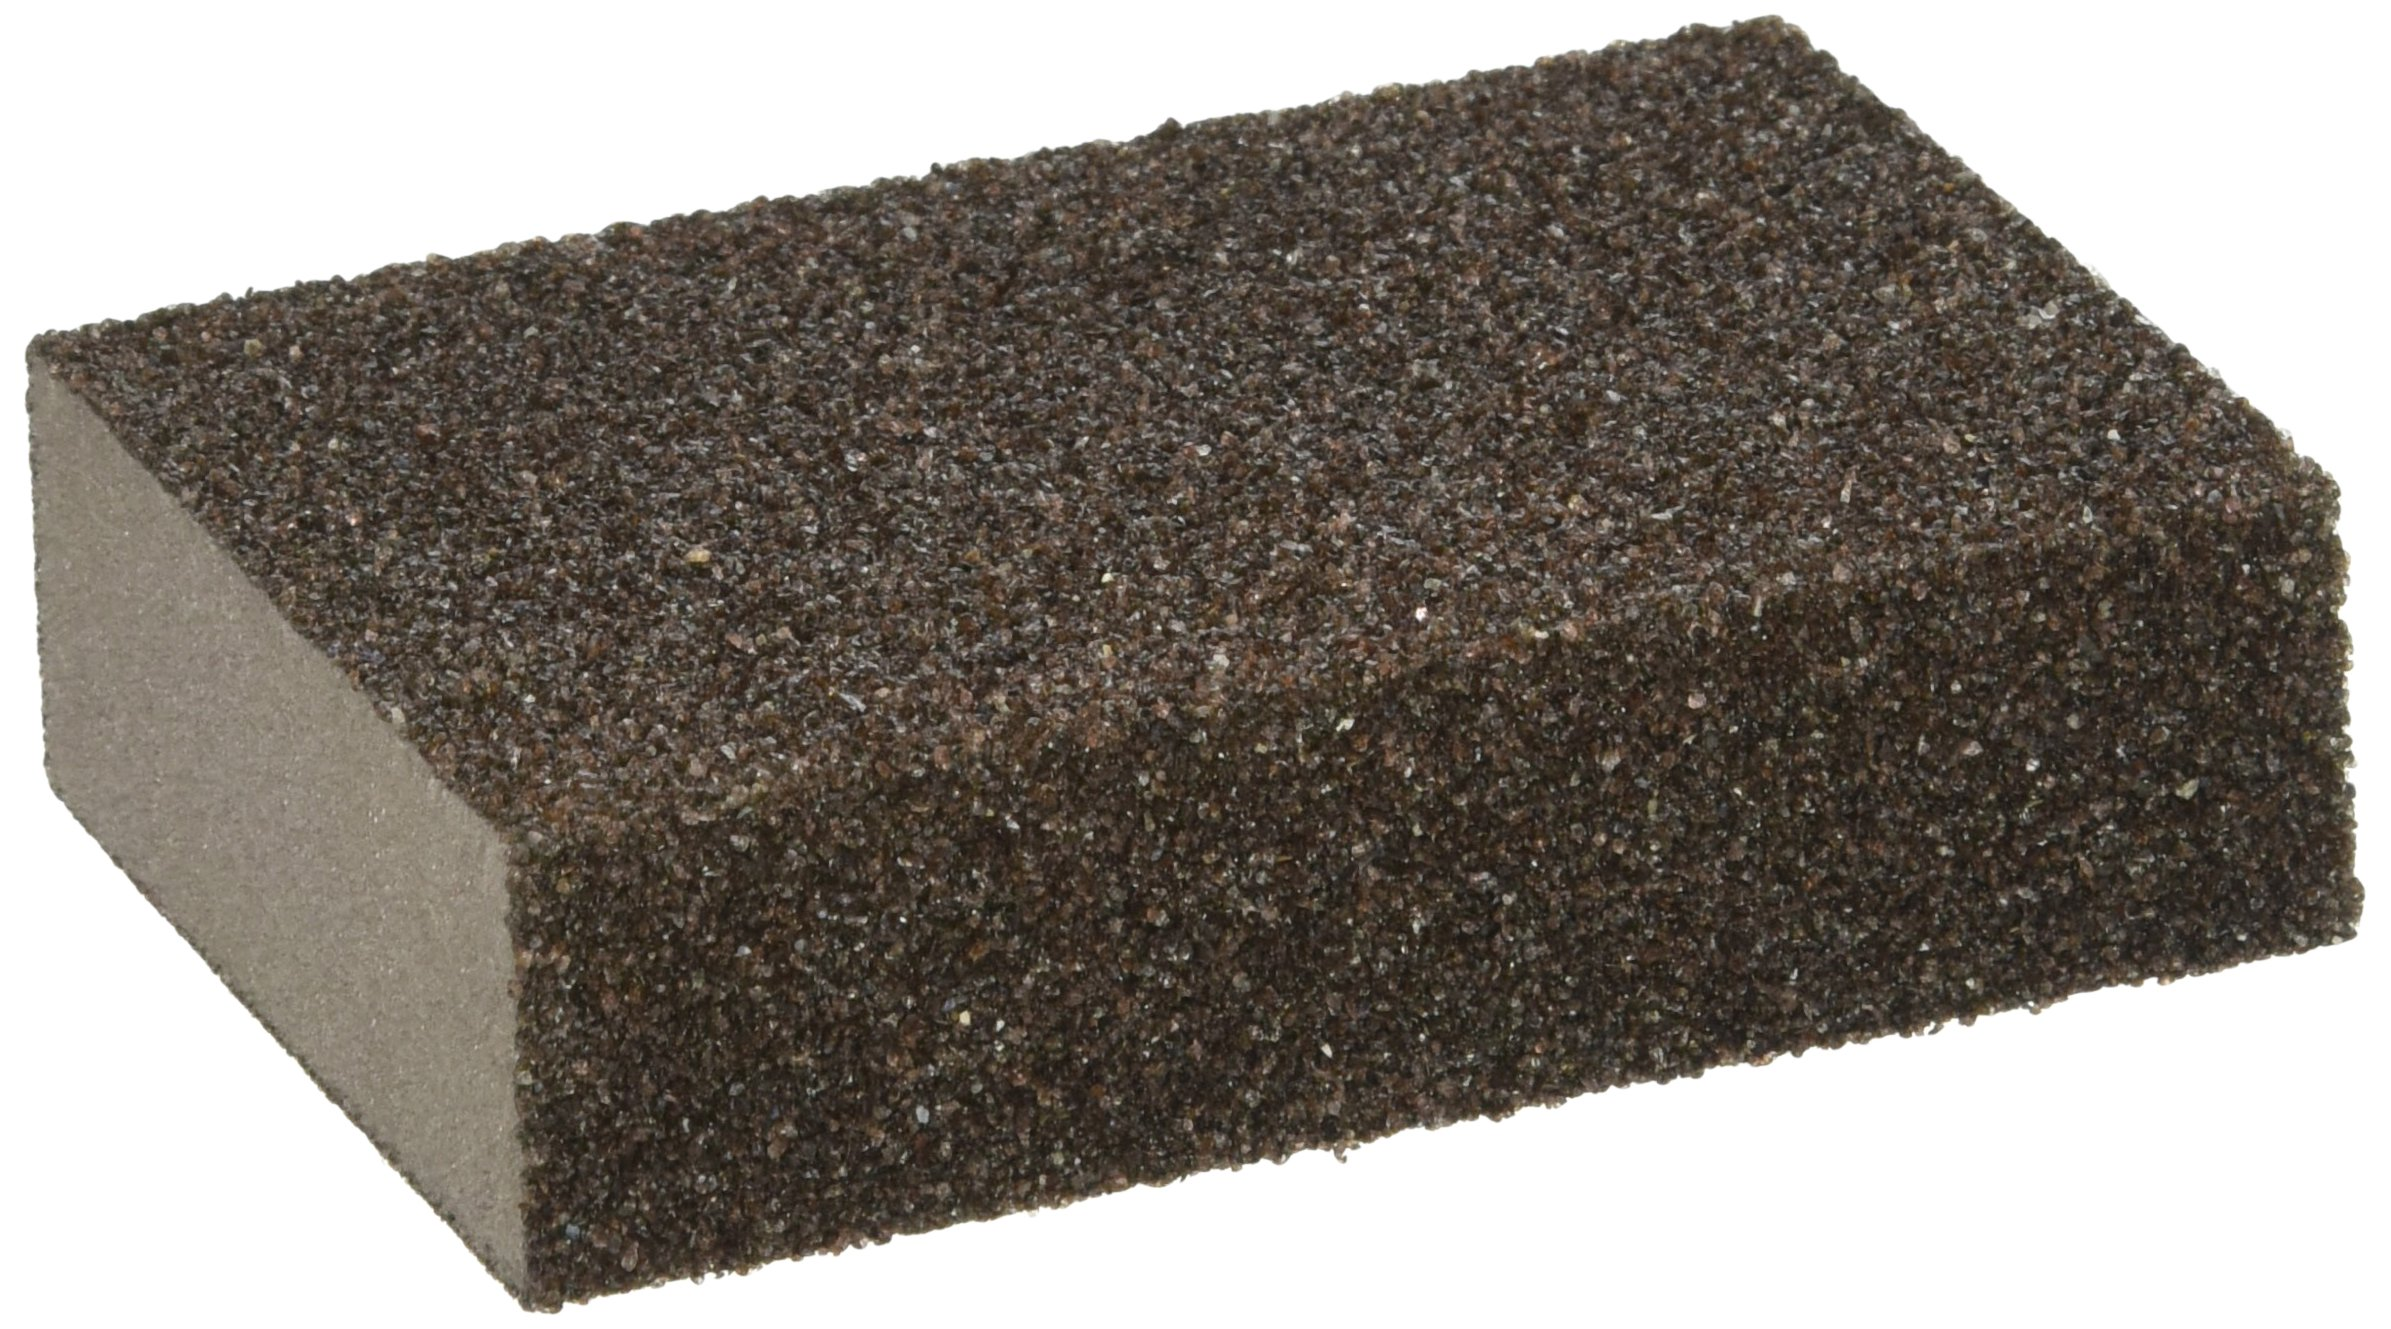 Medium/Coarse Sandbar